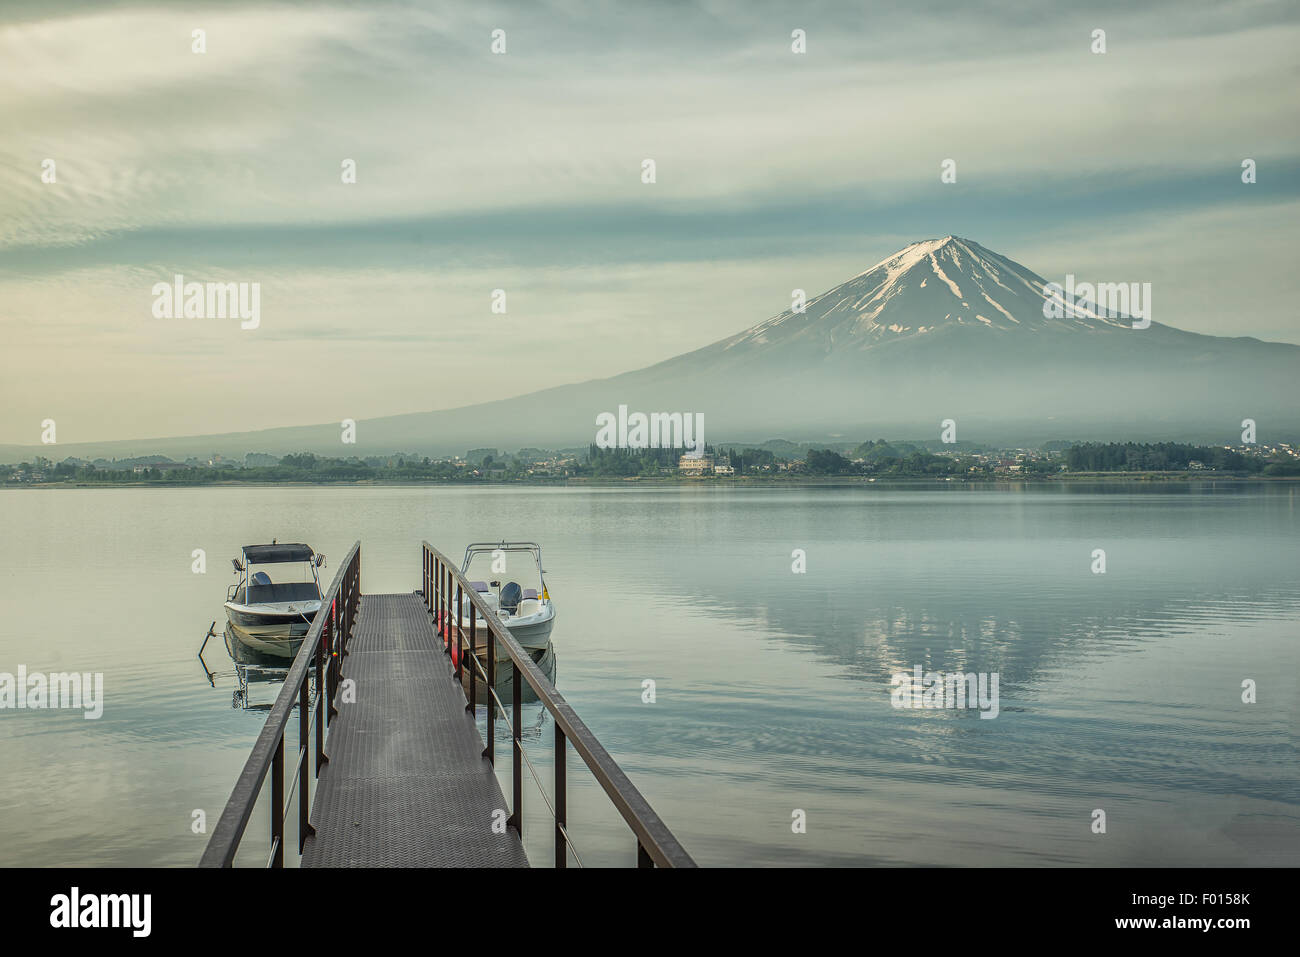 Mt.Fuji et jetée de Kawaguchiko, Japon Photo Stock